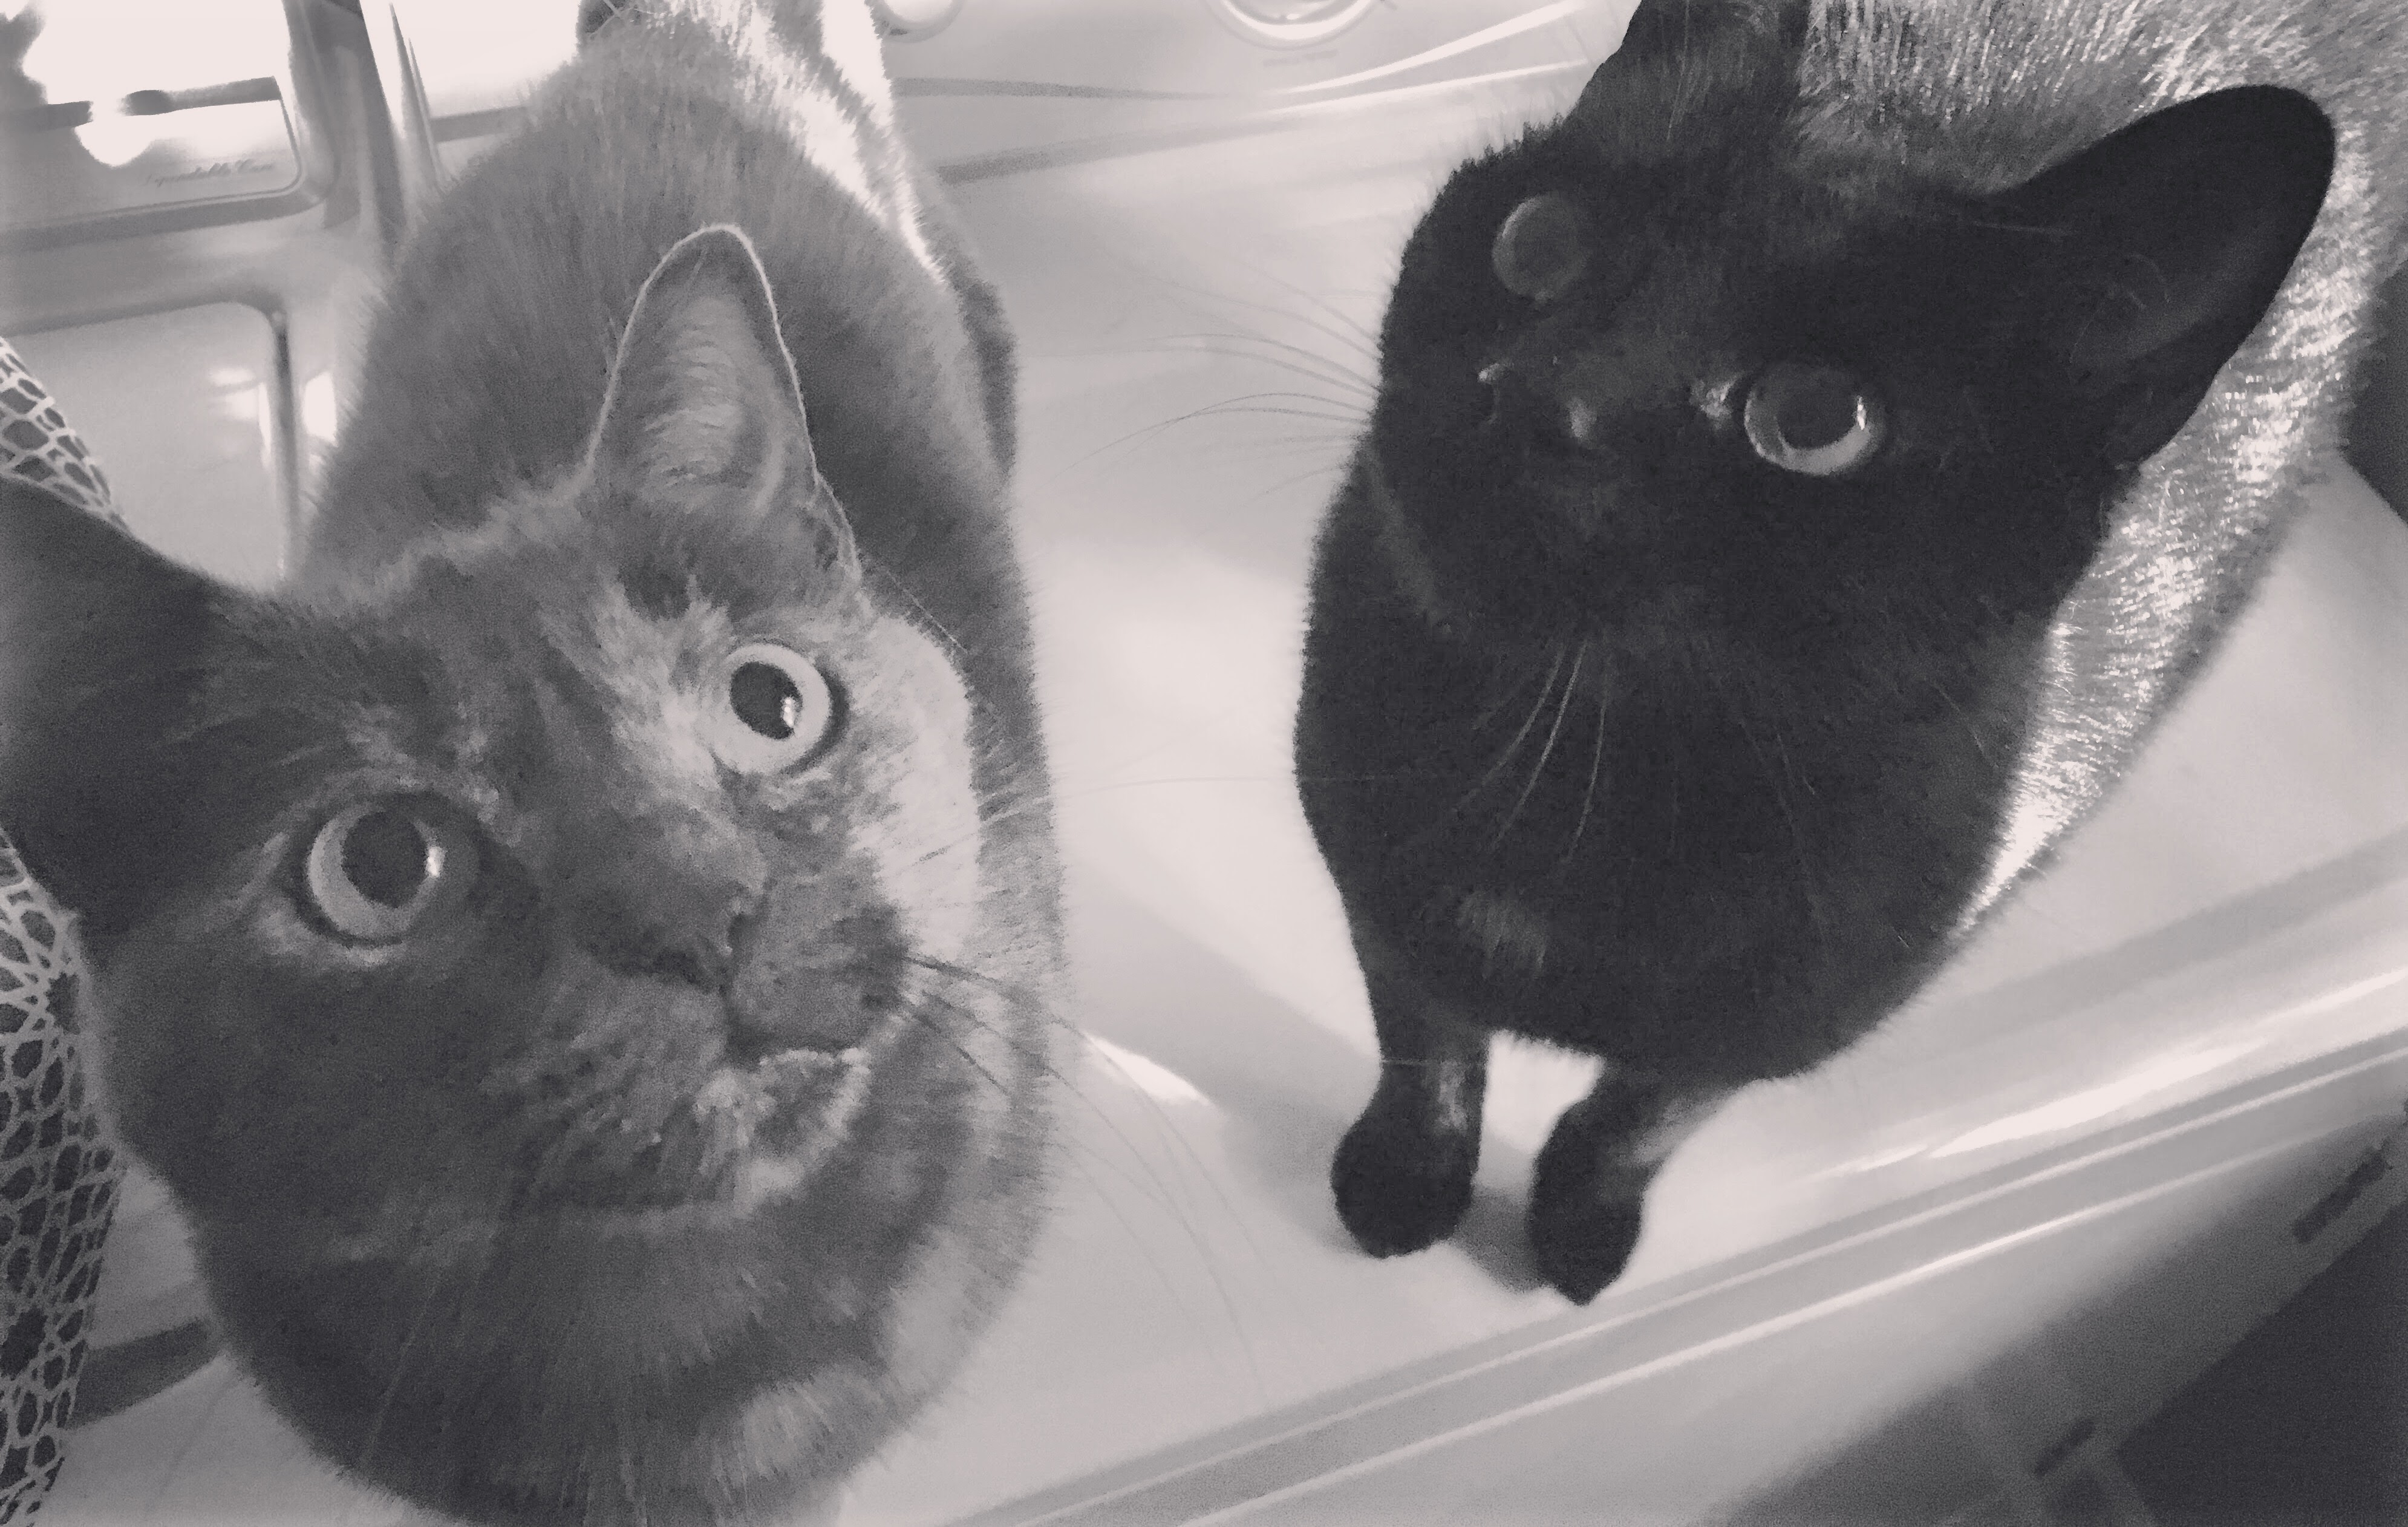 Lil' Bit & Gus